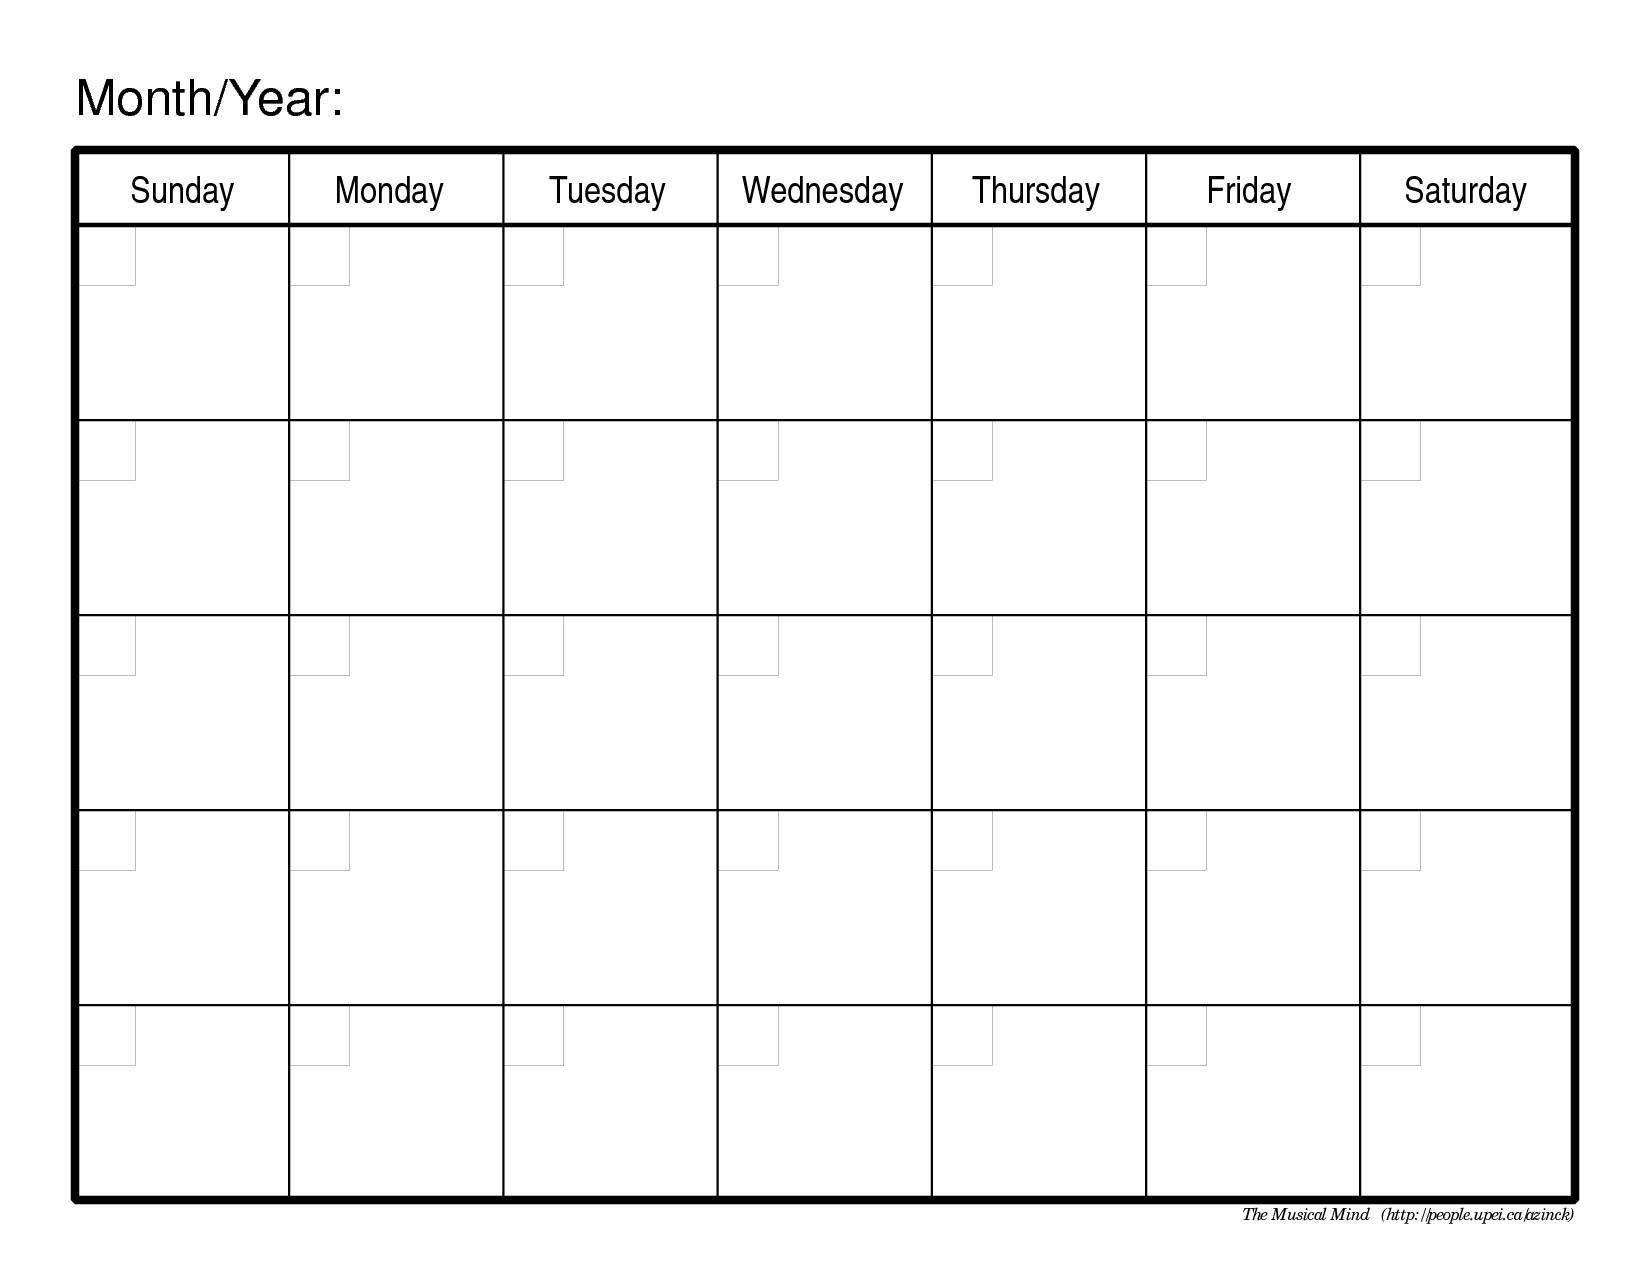 4X6 Blank Monthly Calendar Template | Template Calendar Printable with 4X6 Blank Monthly Calendar Template